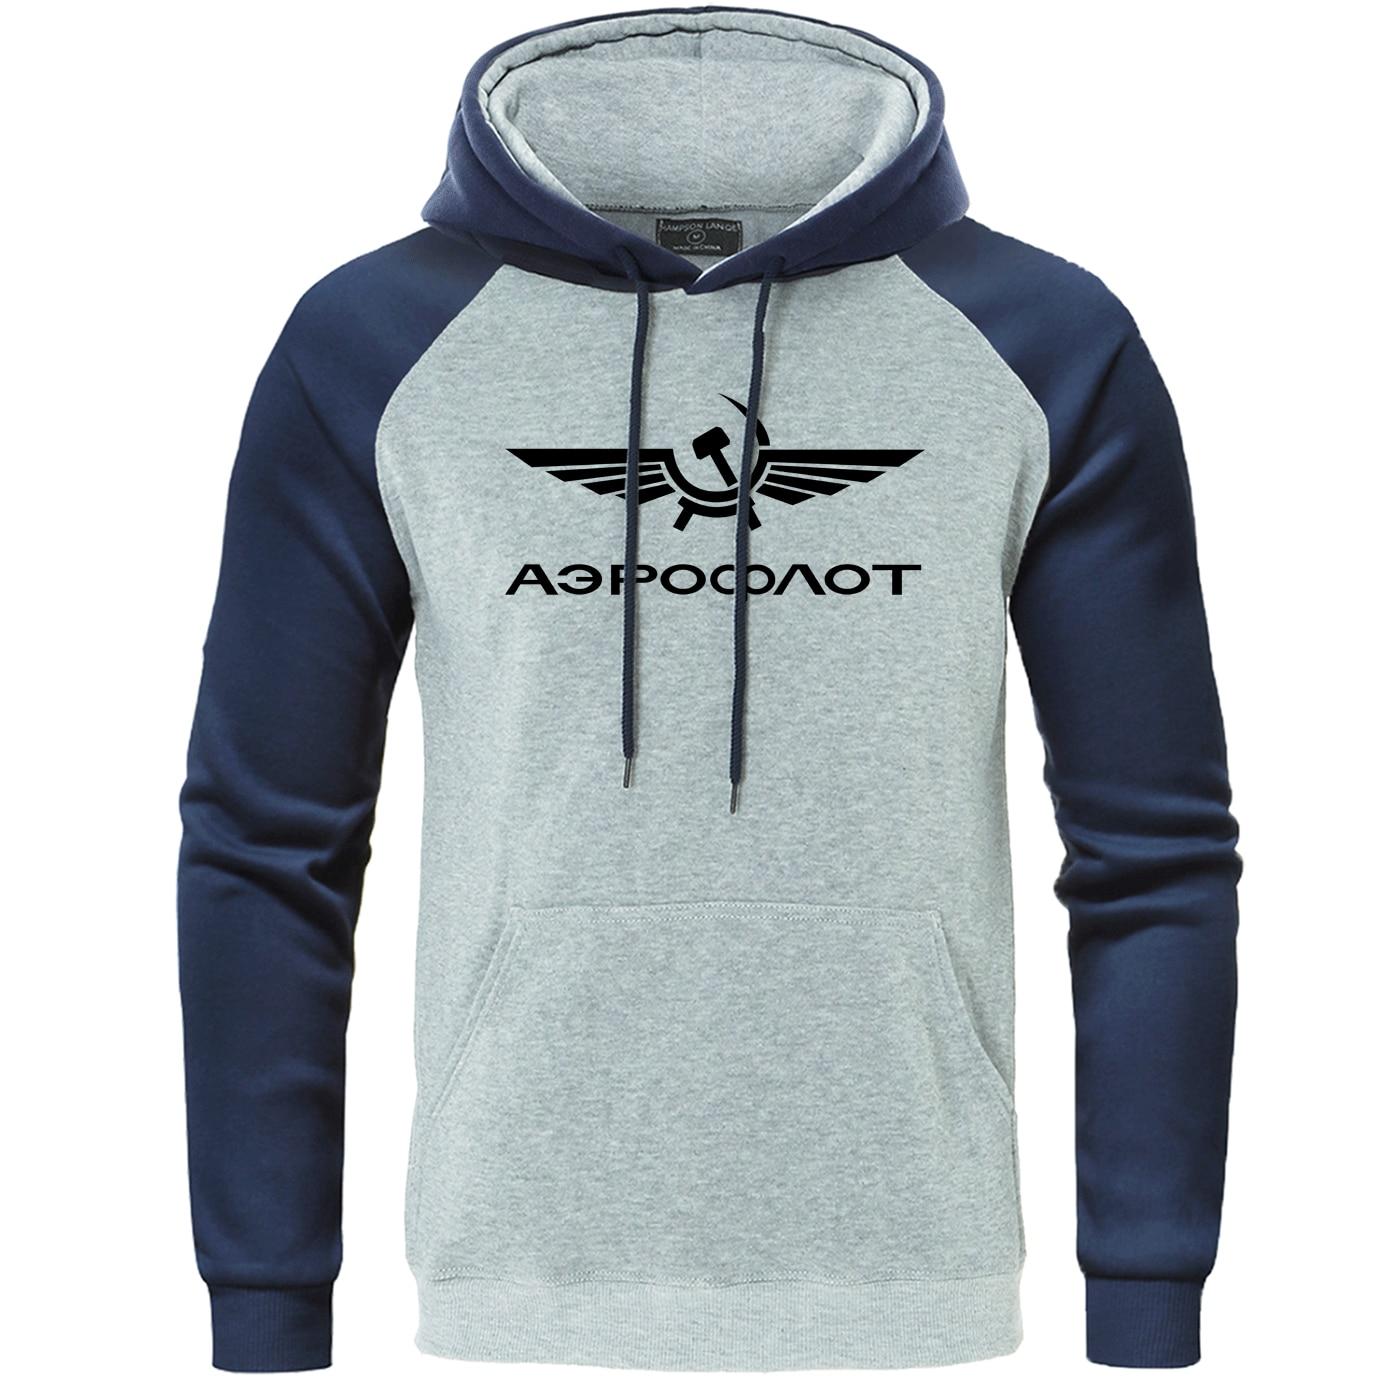 Autumn Fleece Warm Mens Hoodies Fashion O-Neck Stylish Aeroflot CCCP Civil Aviation Russe Airforce Raglan Sweatshirt Pullover